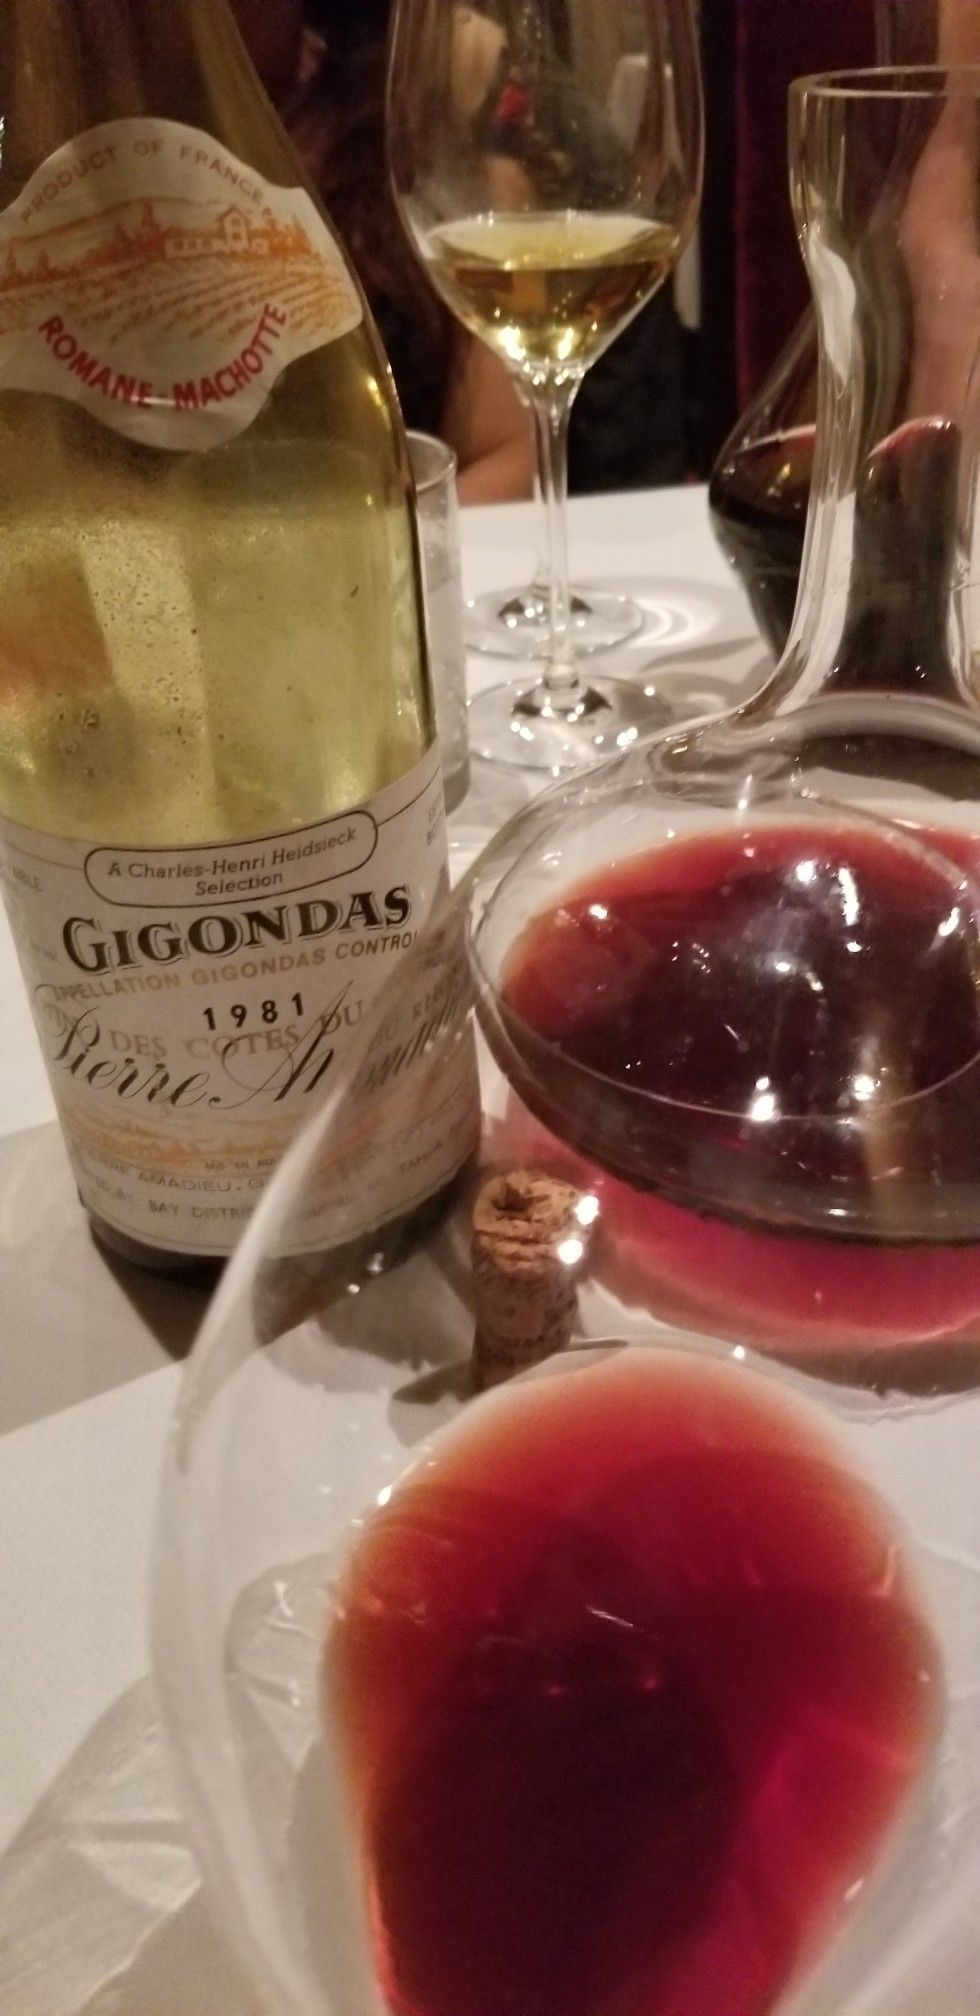 Winewednesday Redwine Winetasting Winelover Winetime Instawine Winecountry Winelovers Wineaddict Winepair In 2020 Wine Down Wednesday Wine Bottle Wine Lovers